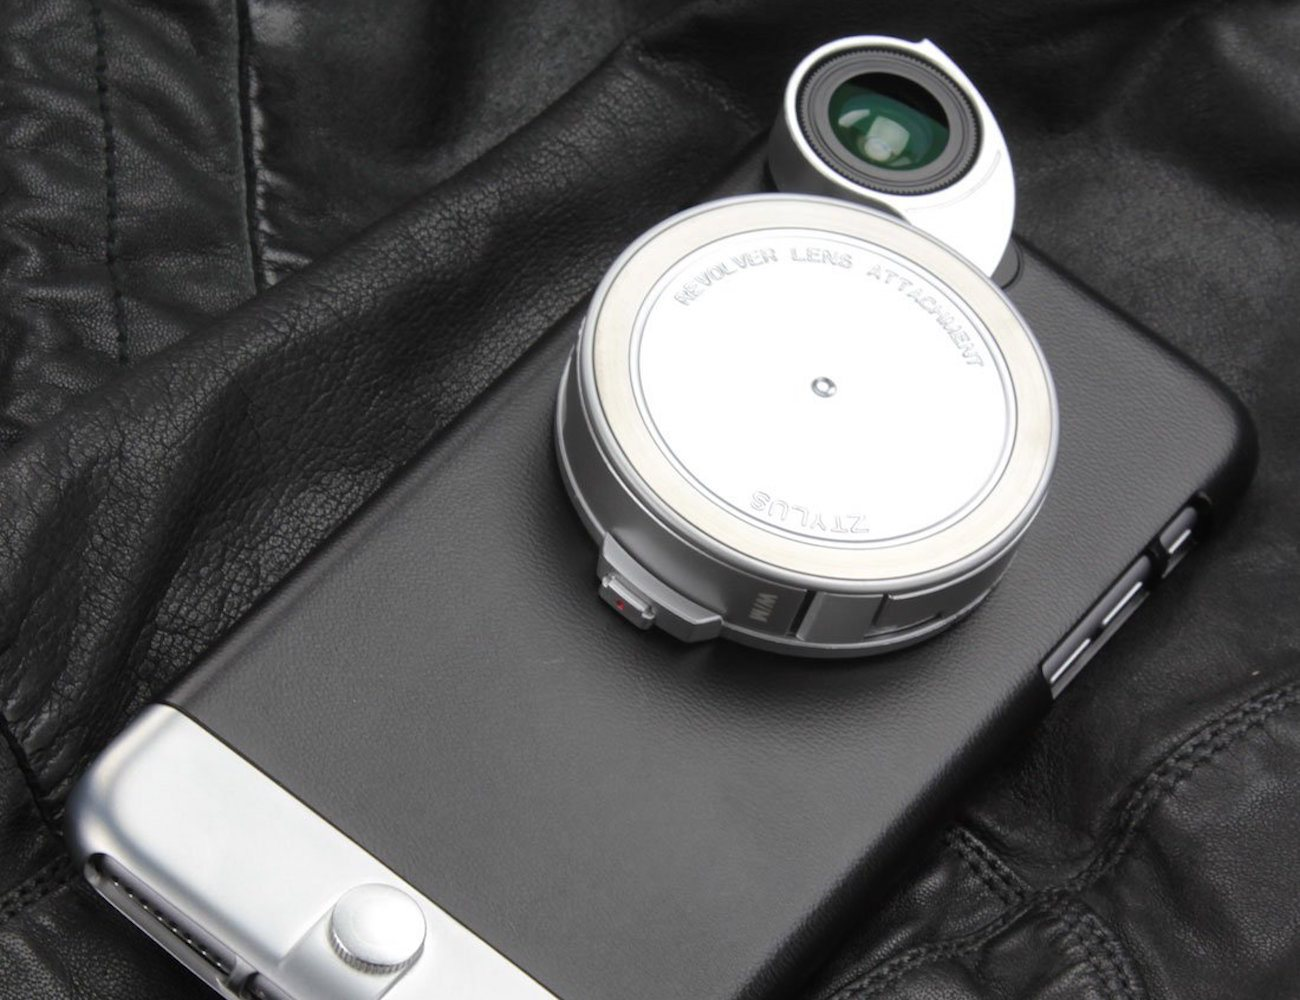 Ztylus – iPhone 6 Plus Metal Case and Lens Adapter Kit